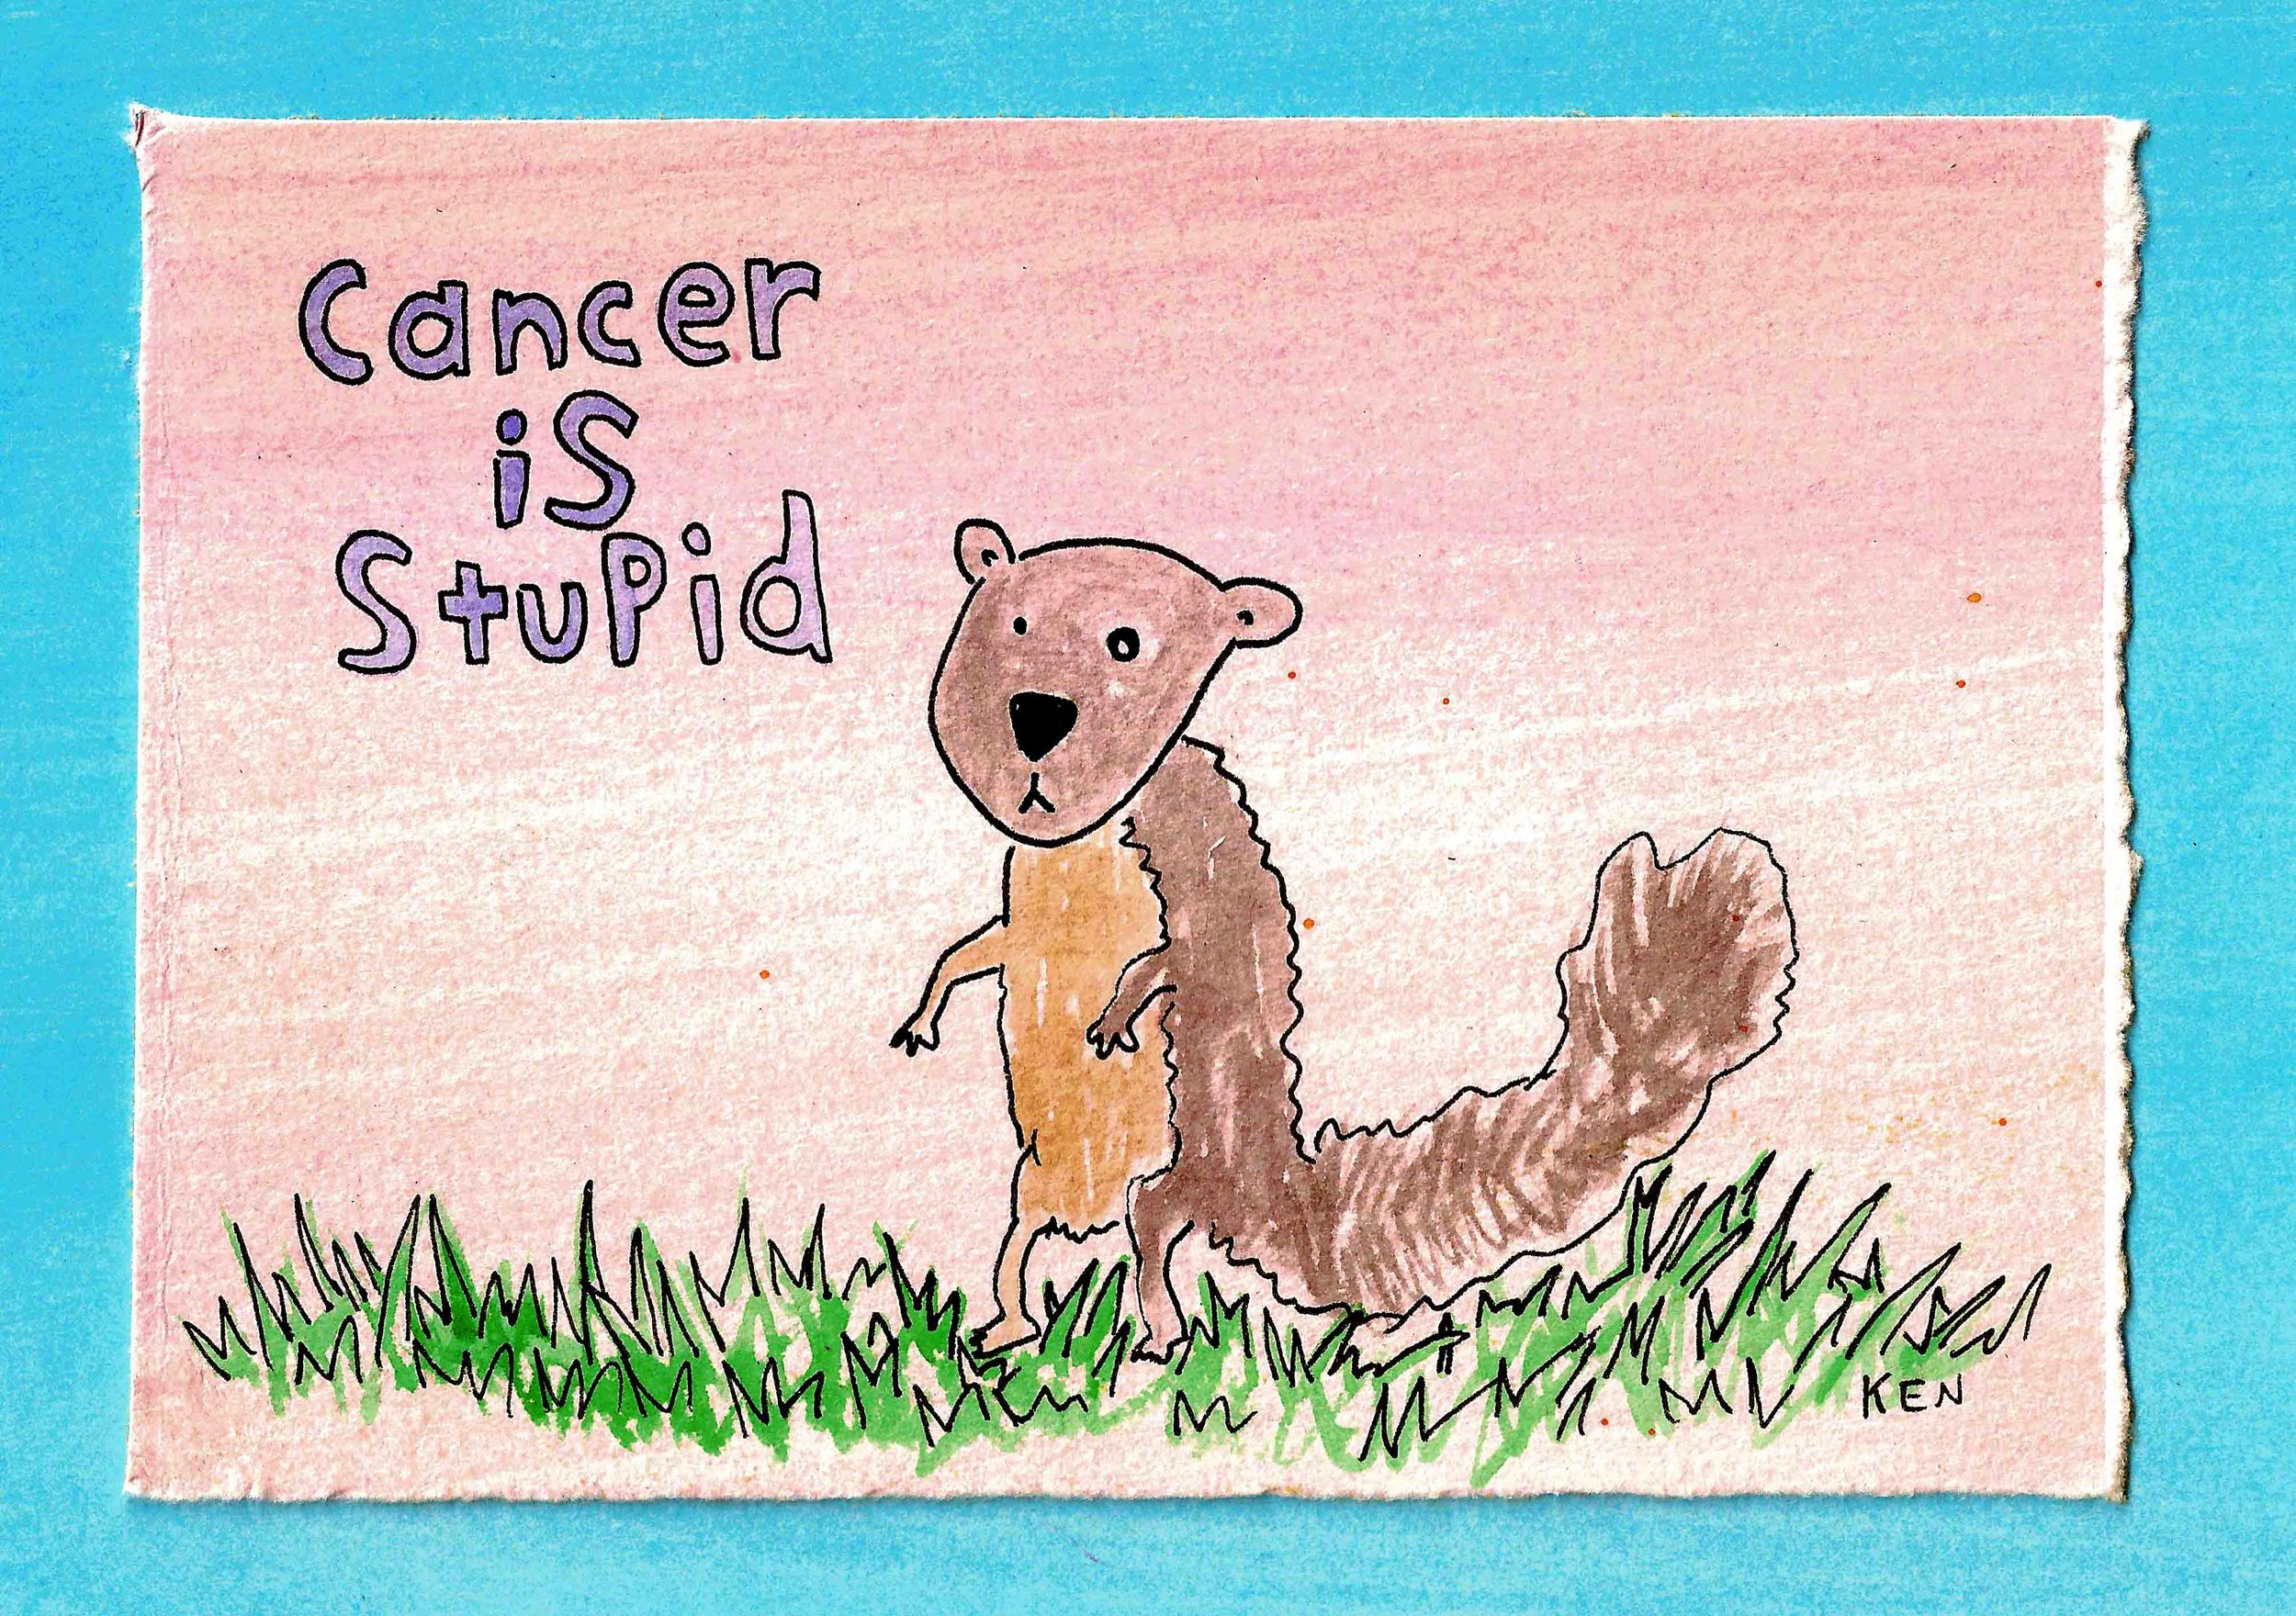 cancer is stupid scan.jpg